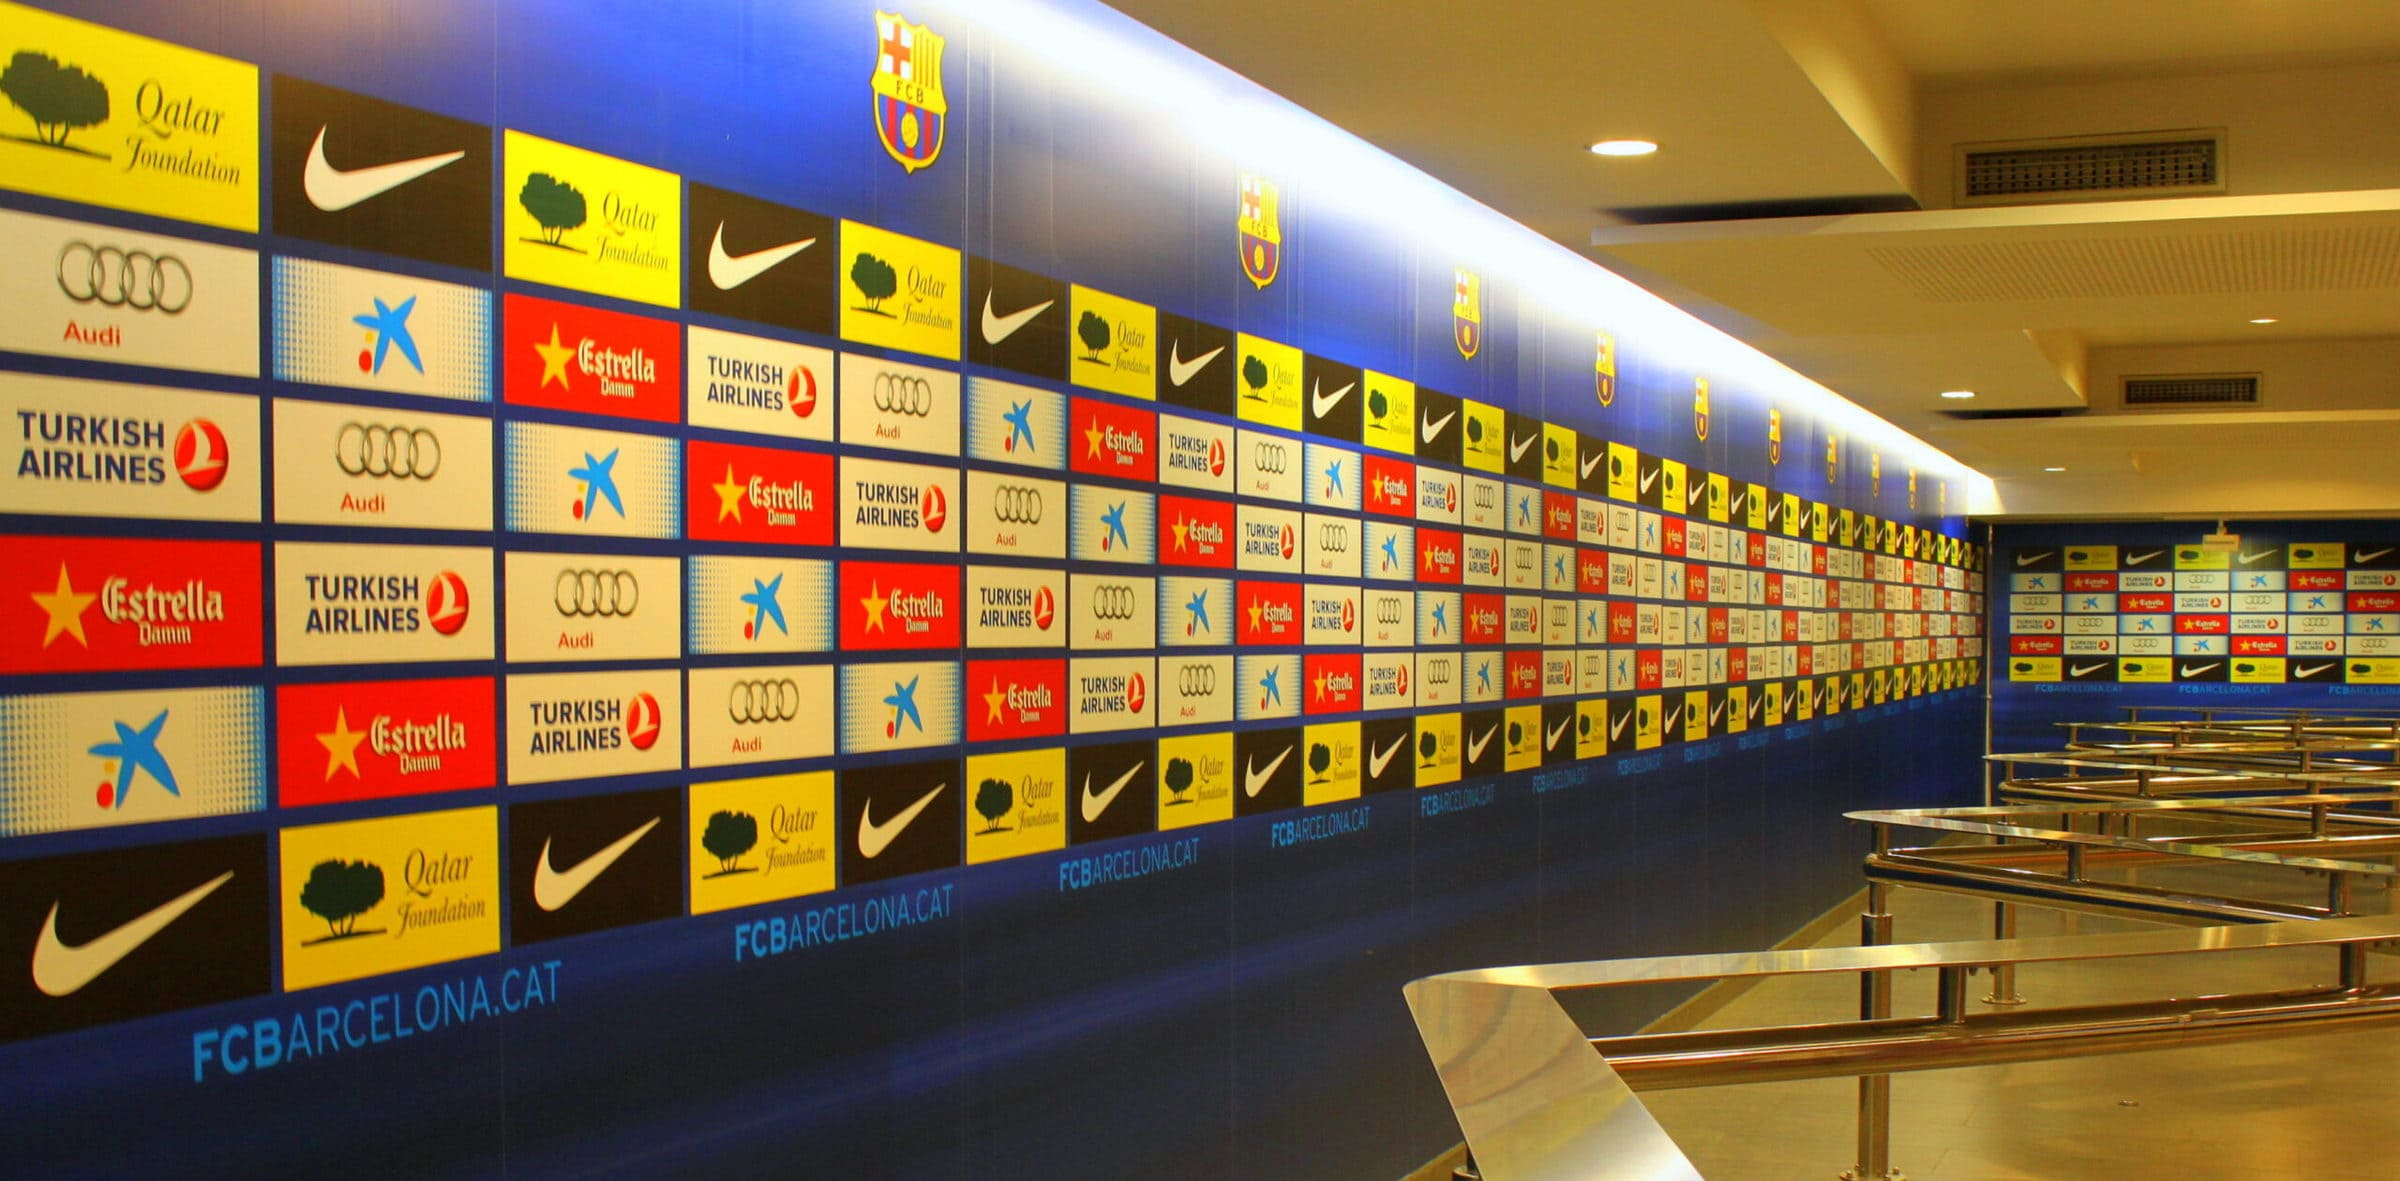 Pressebereich, Camp Nou Stadion, Barcelona